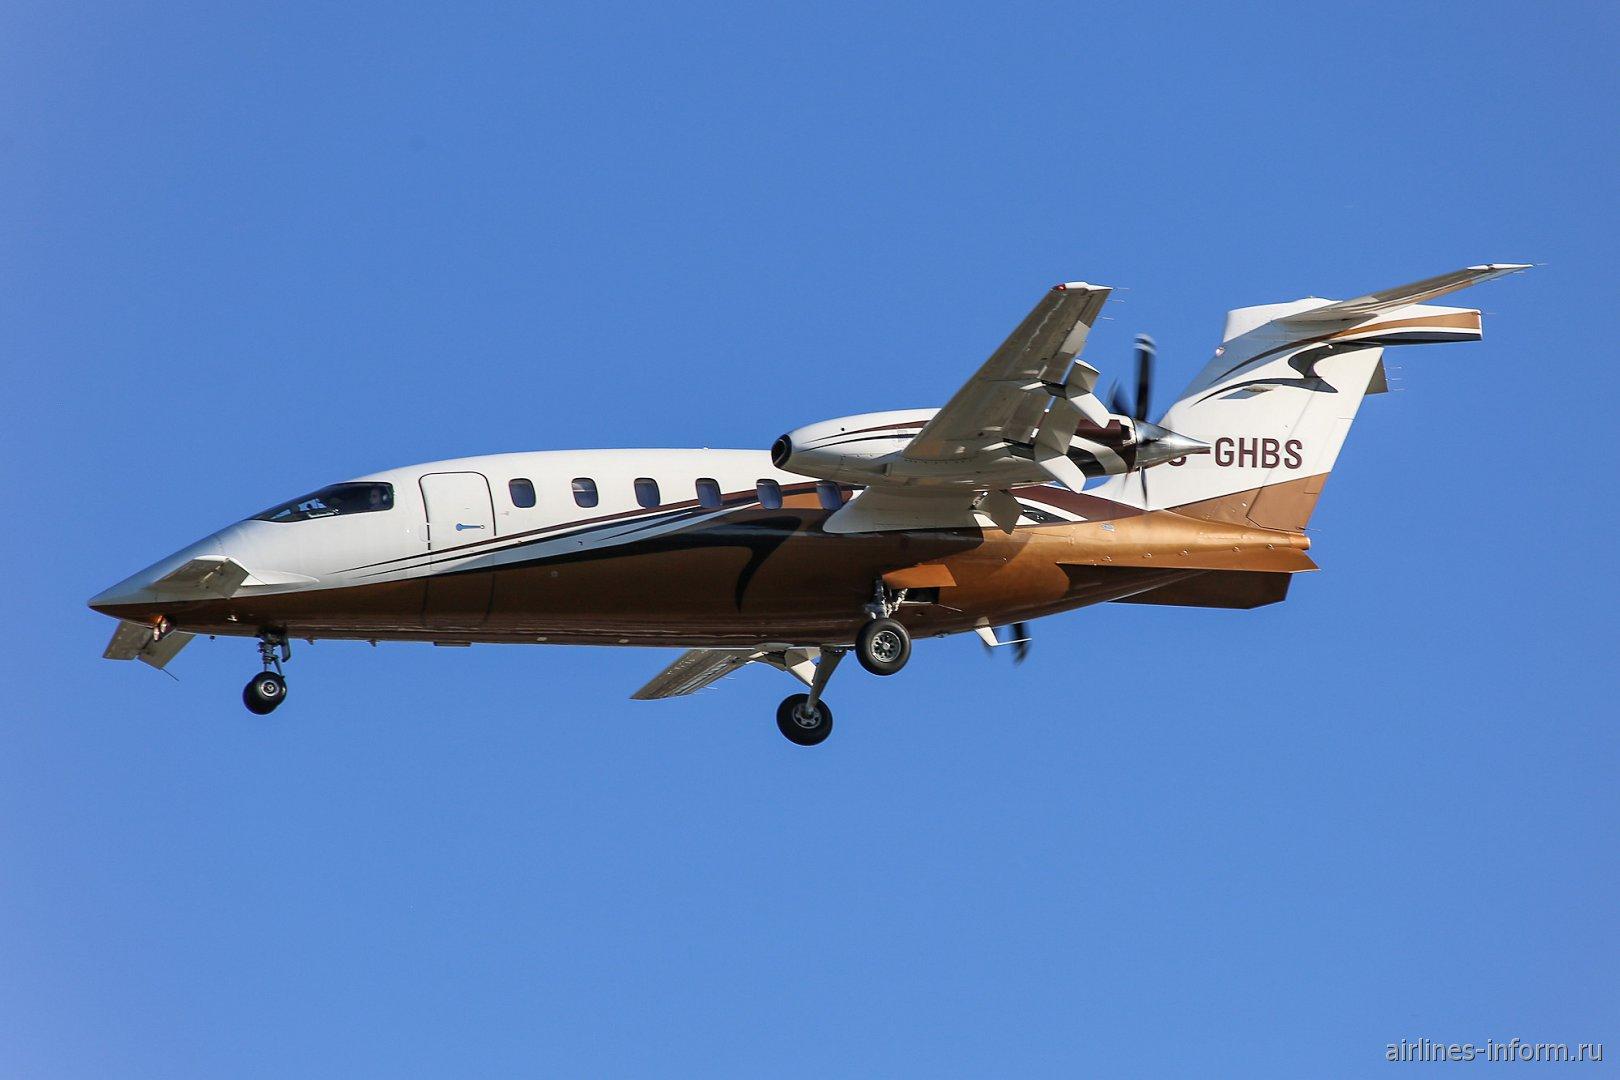 Самолет Piaggio P.180 Avanti с номером C-GHBS